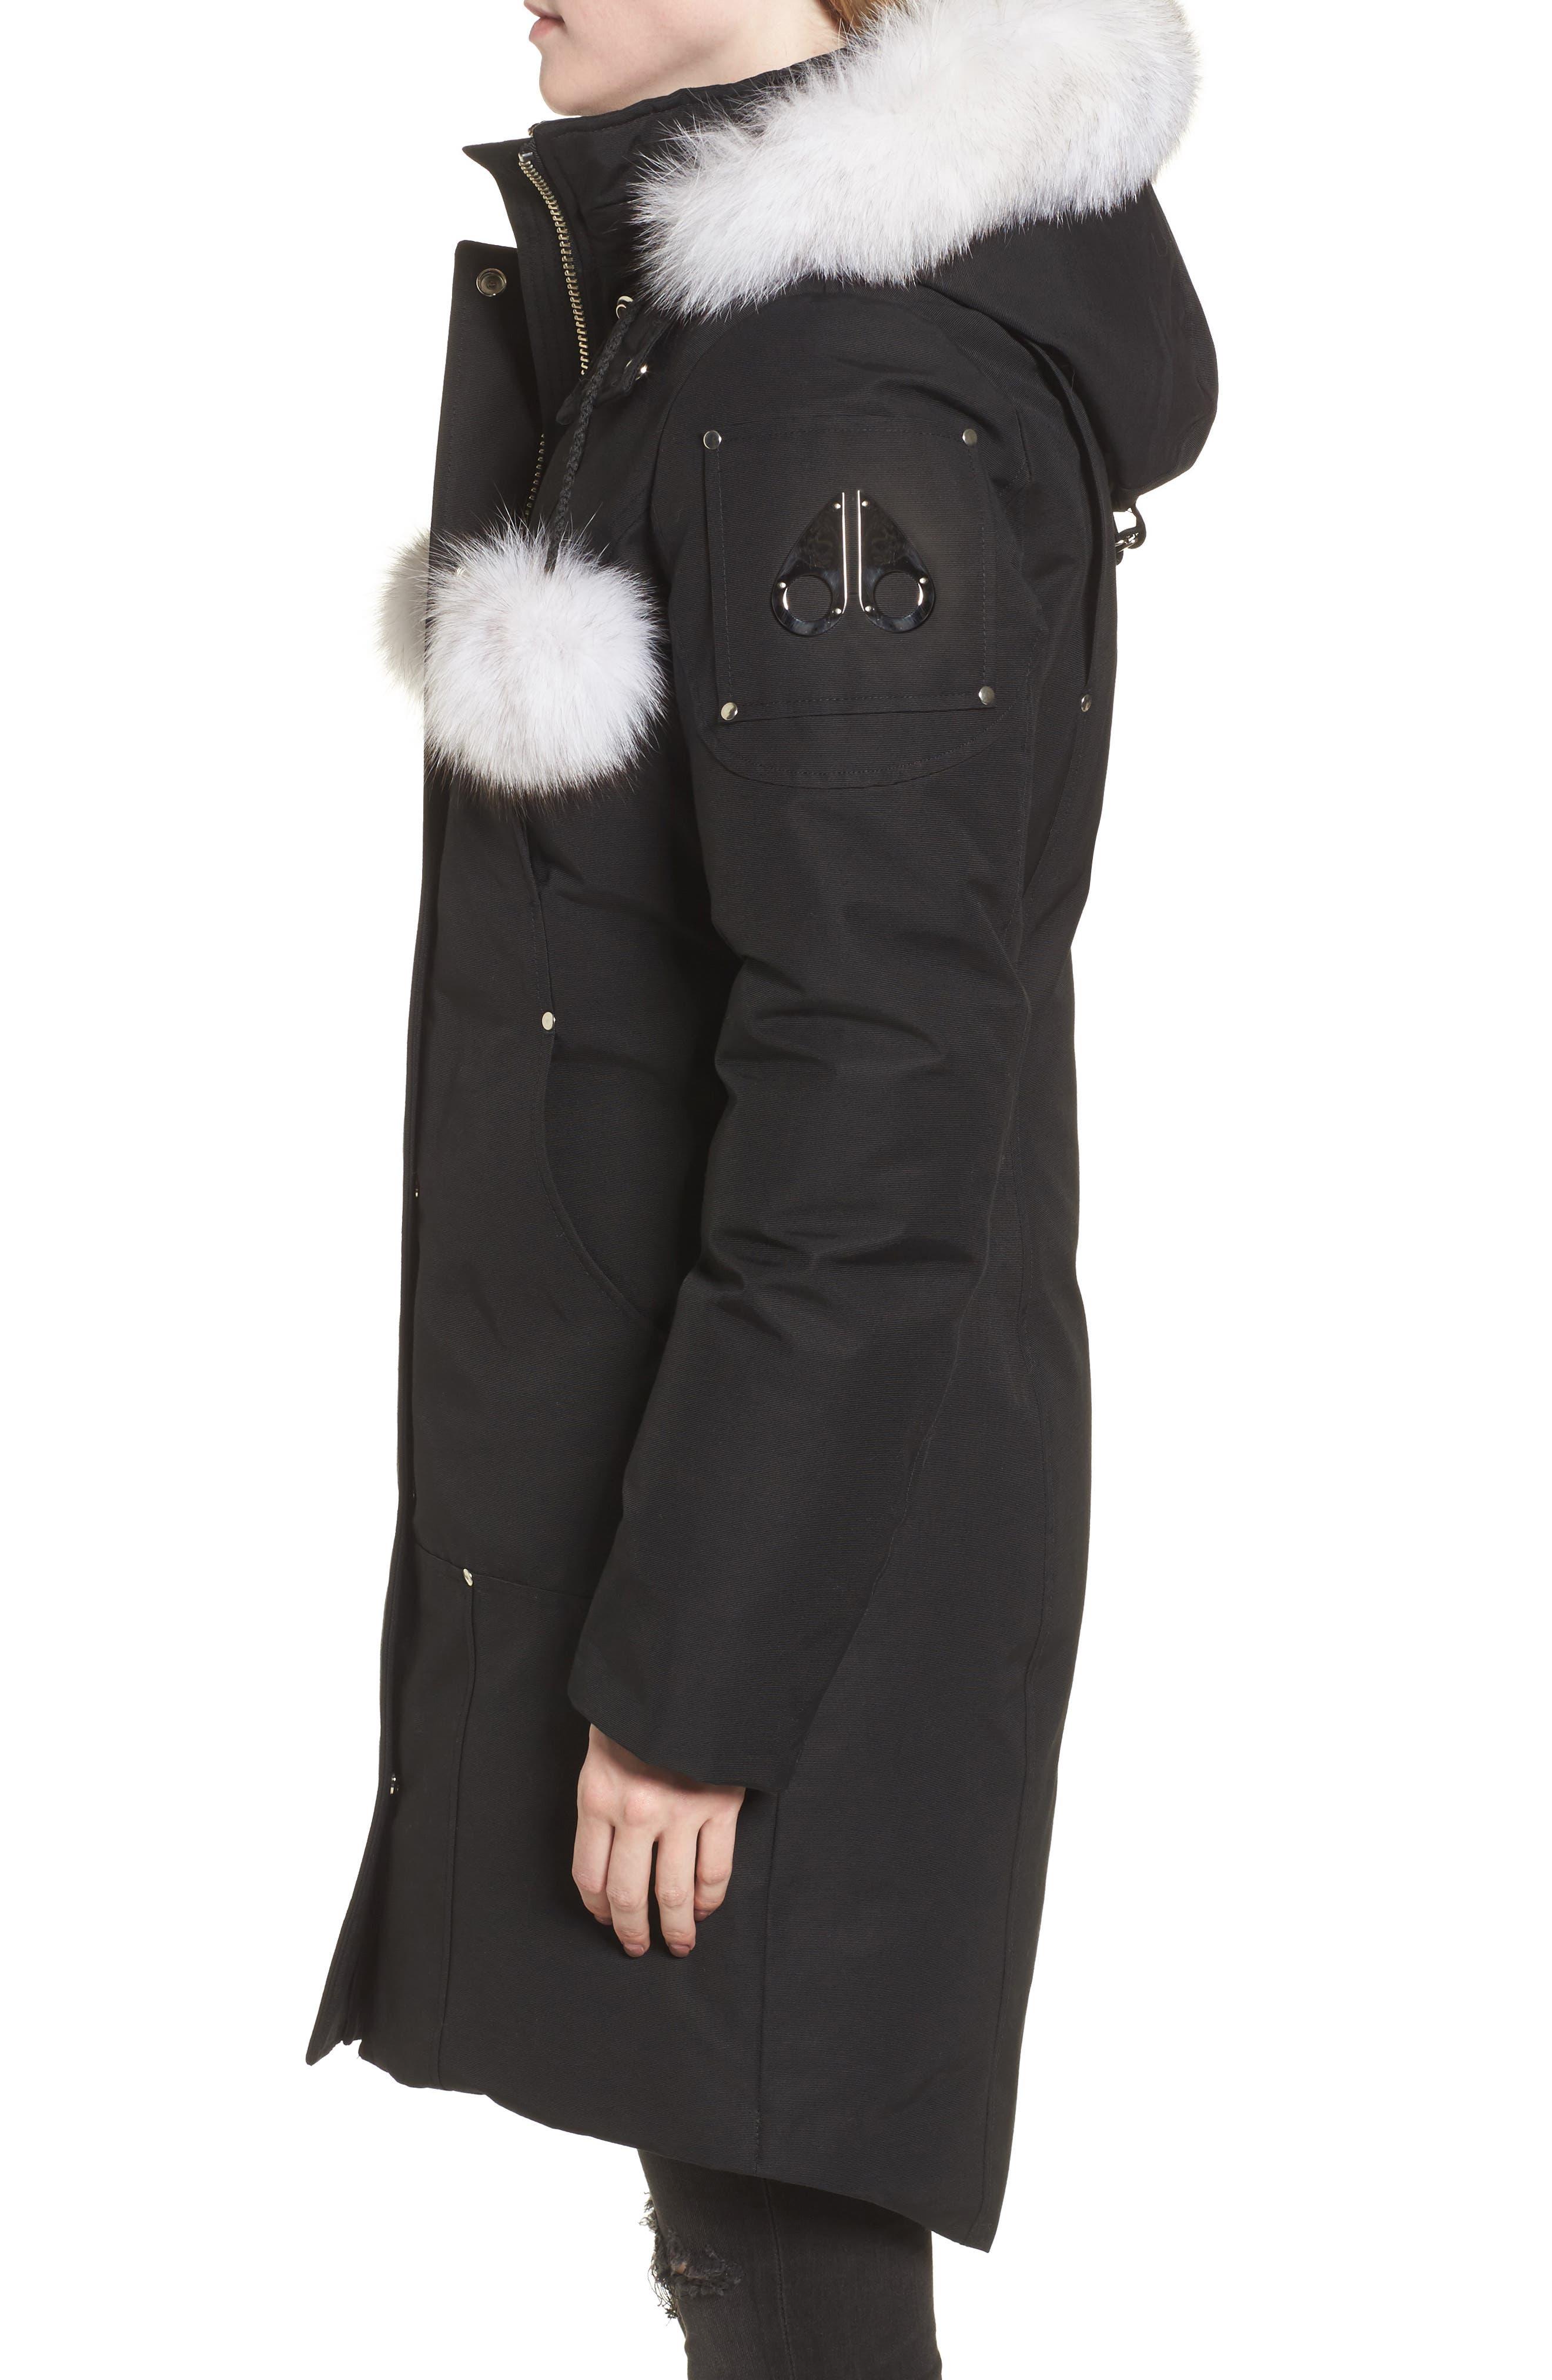 Alternate Image 3  - Moose Knuckles 'Stirling' Down Parka with Genuine Fox Fur Trim